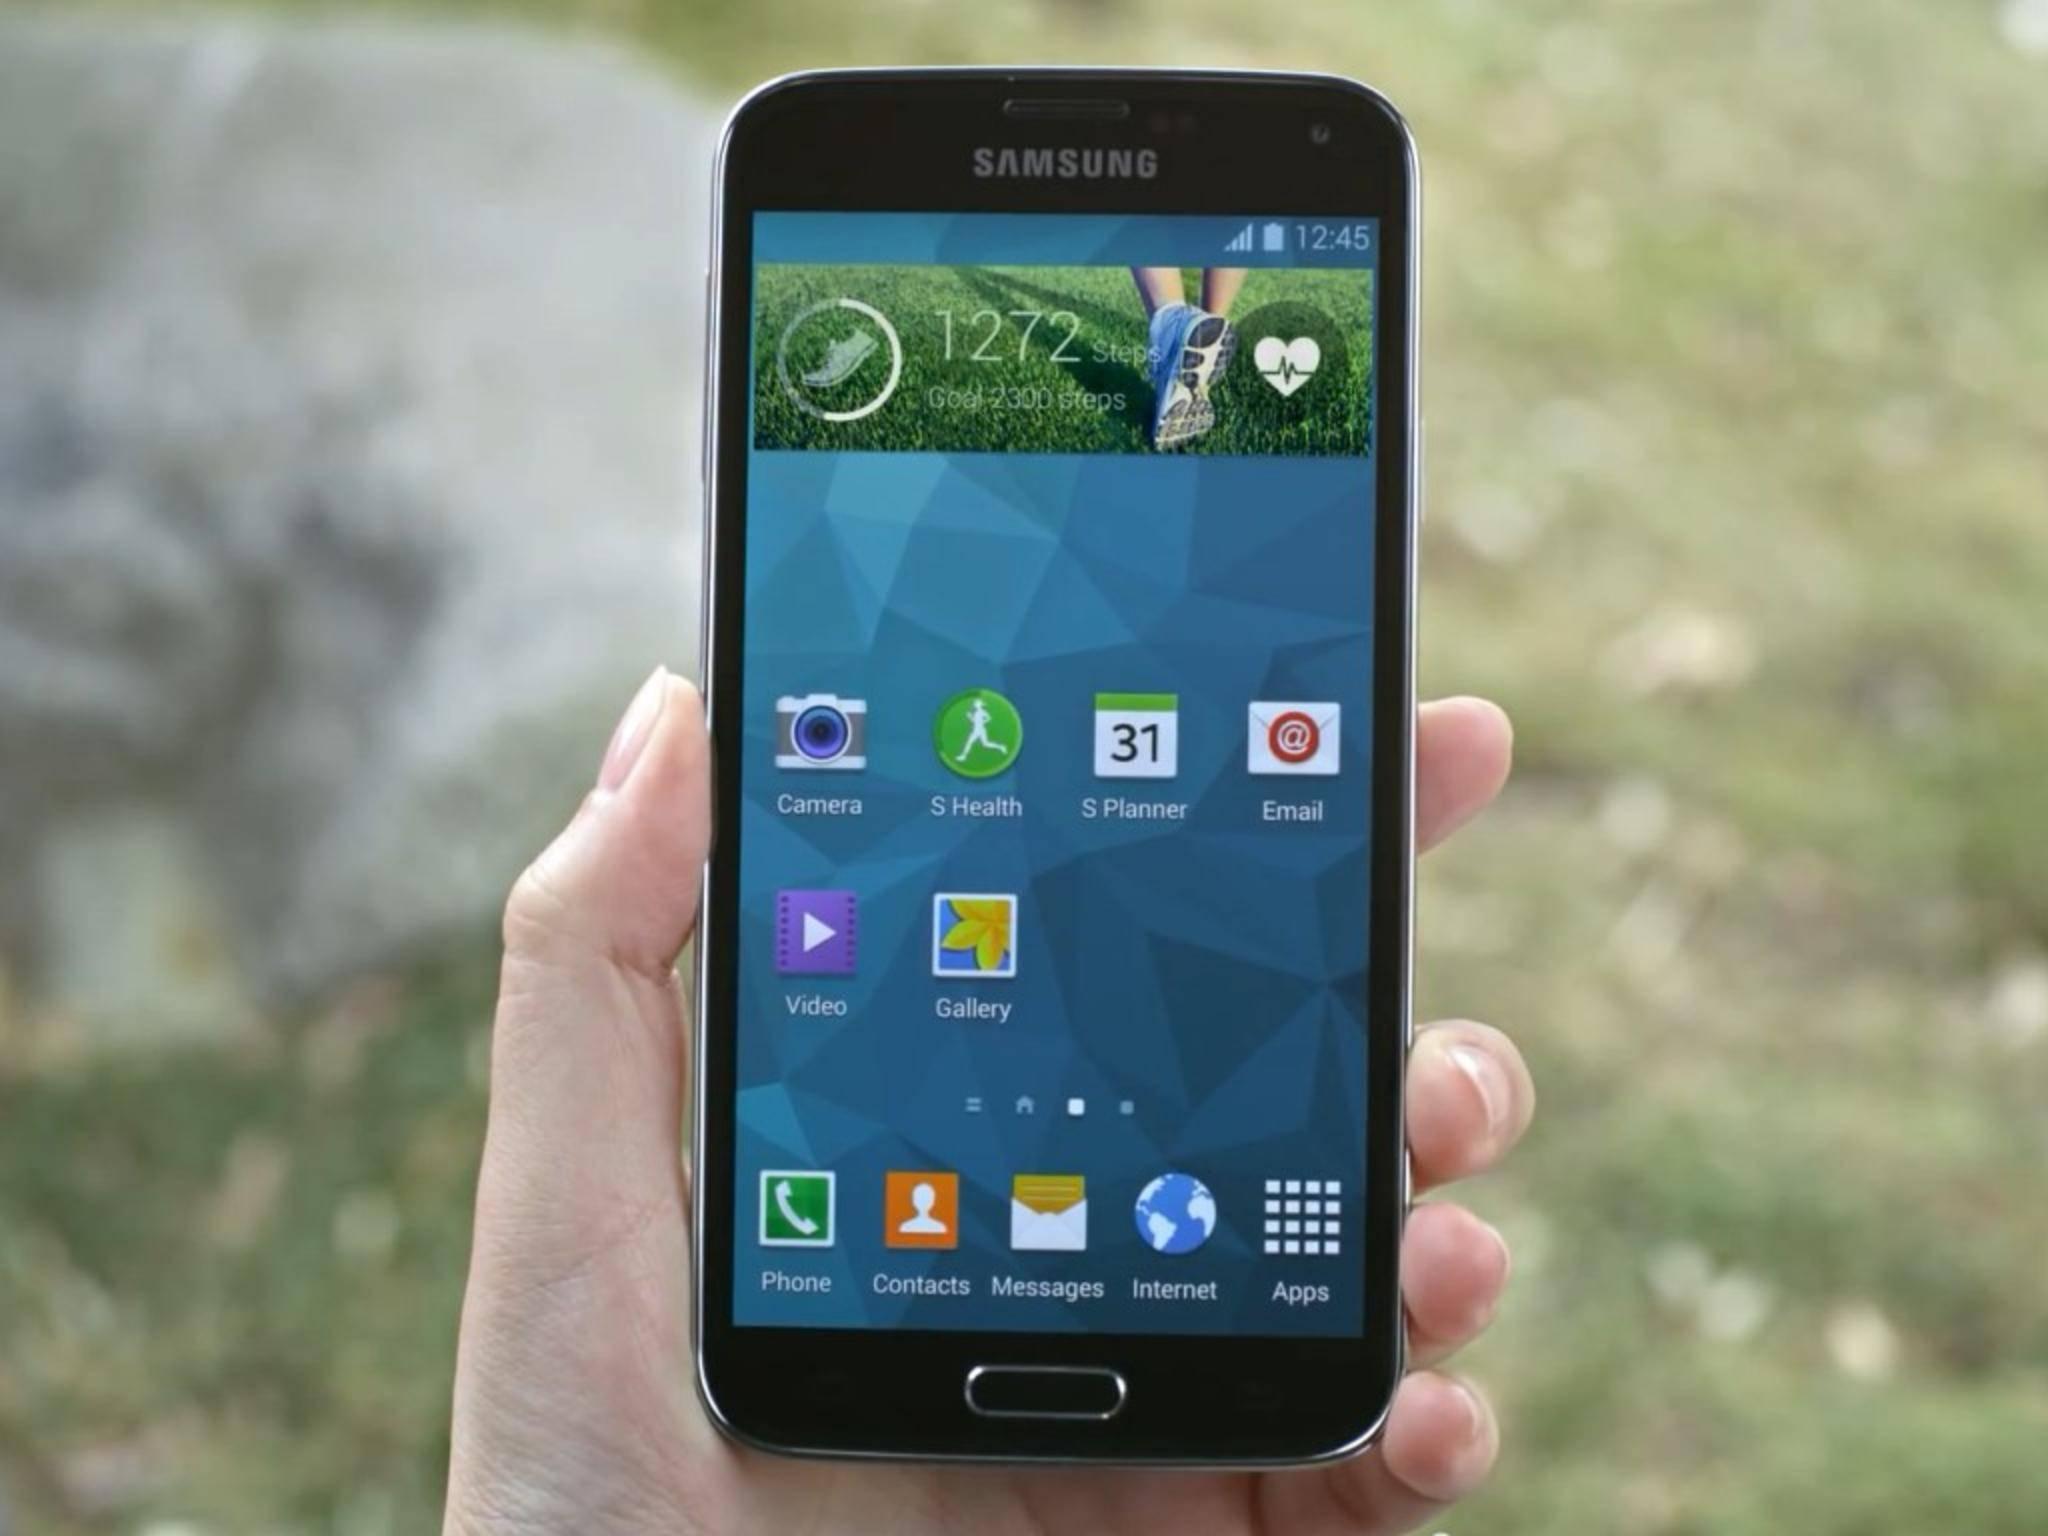 Samsung Galaxy S5: Platz 4 im Google-Ranking.